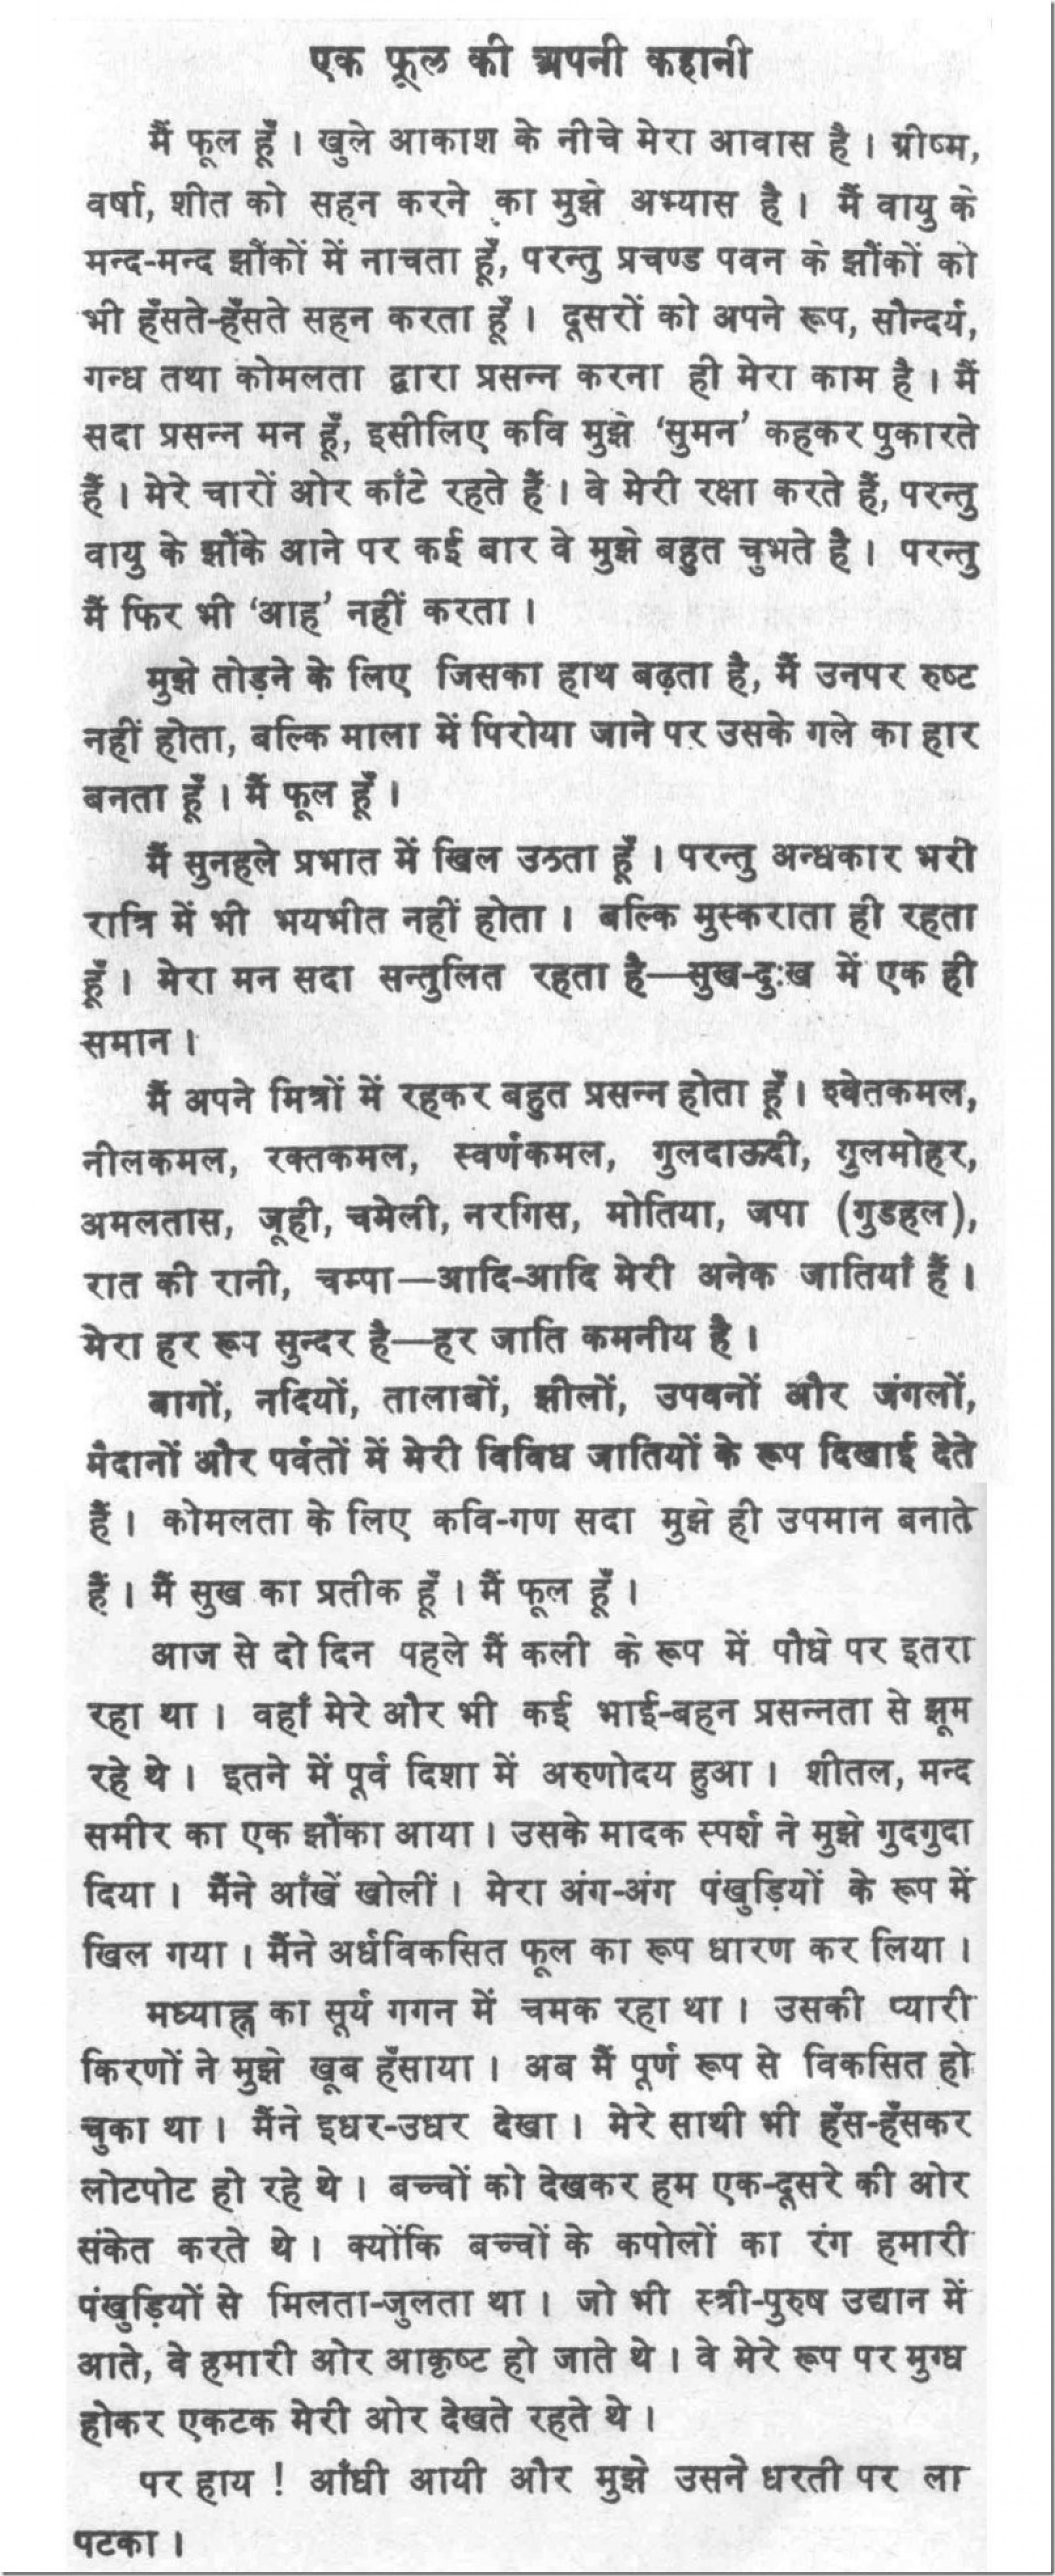 017 About Rose Flower Essay Example 100030 Thumbresize8062c1968 Unbelievable In Marathi Kannada Language 1920